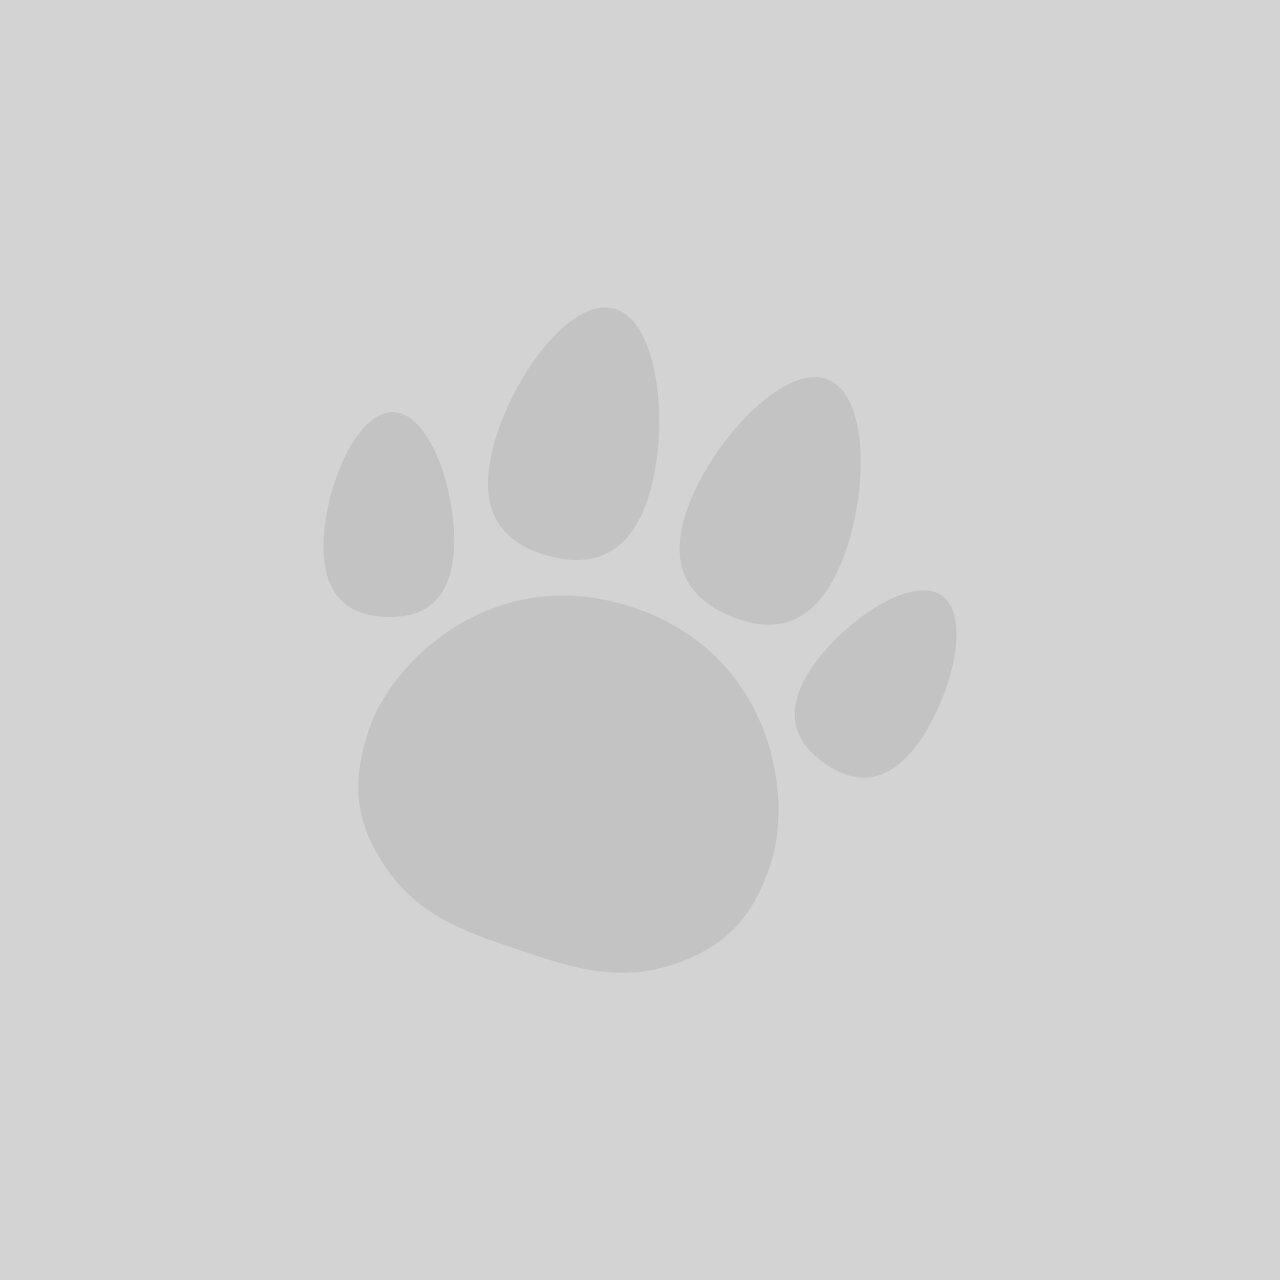 K9 Optimum Adult Dog Chicken (2 Size Options)